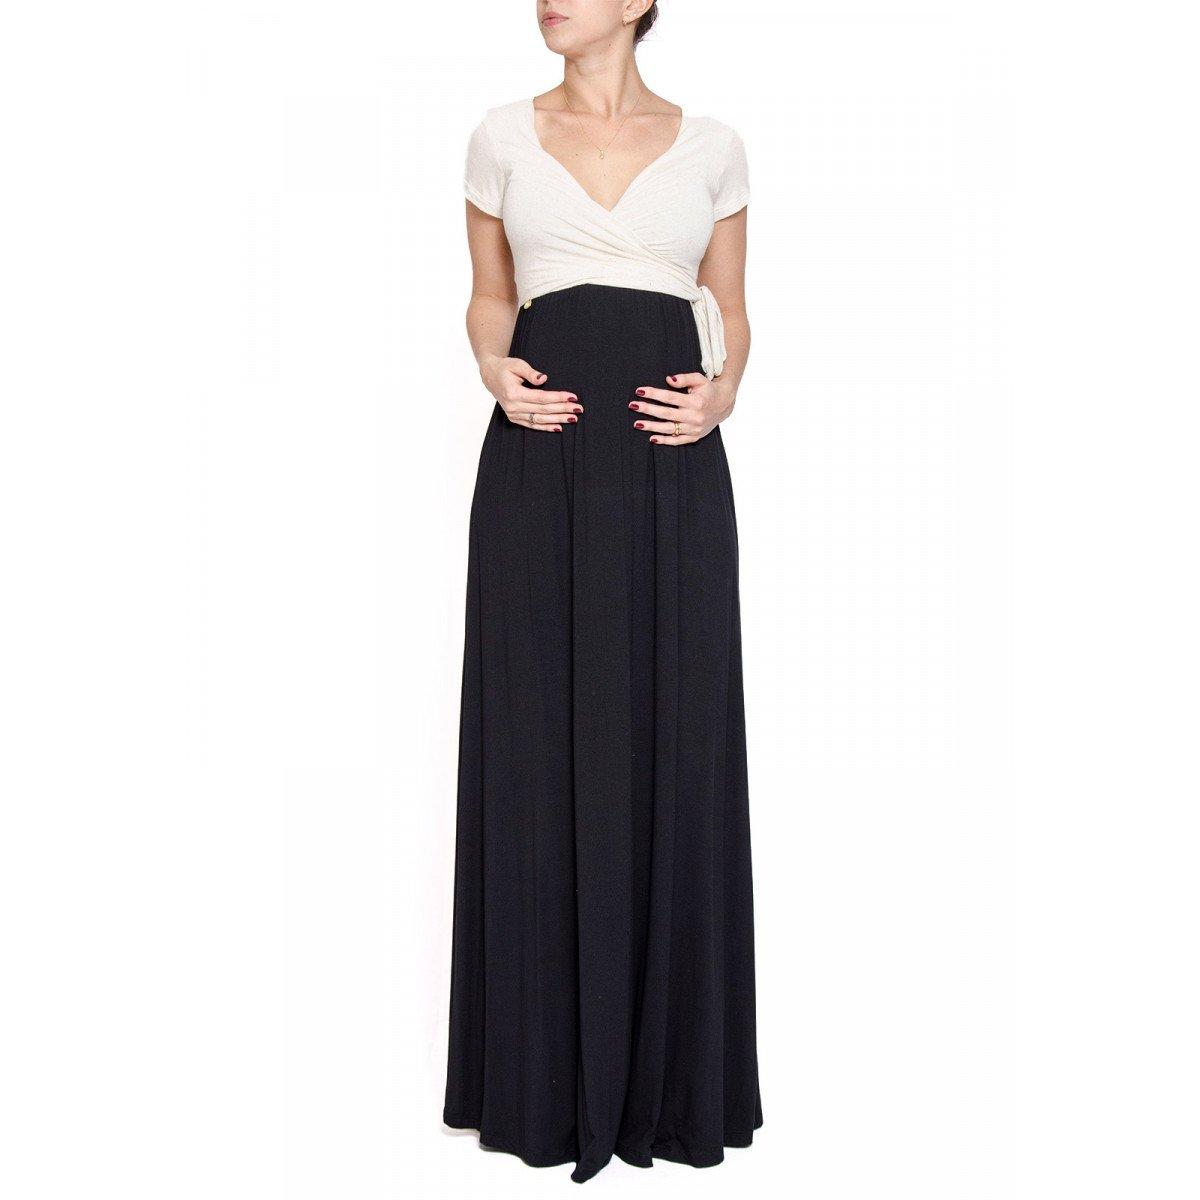 654801af3 Vestido Gestante Bicolor Longo - Off-white > P > | Zattini